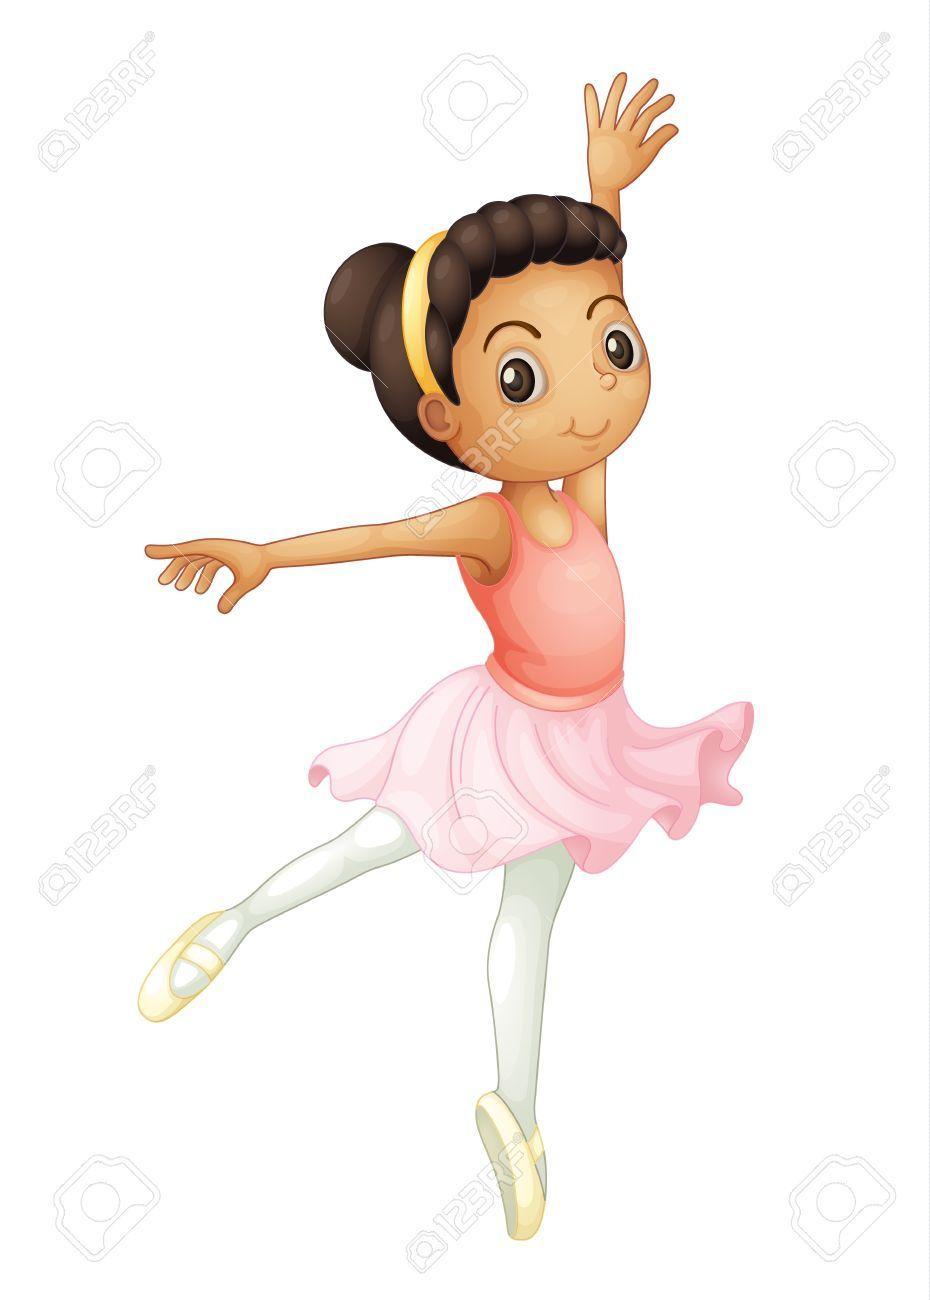 Clipart dancing girl 3 » Clipart Portal.